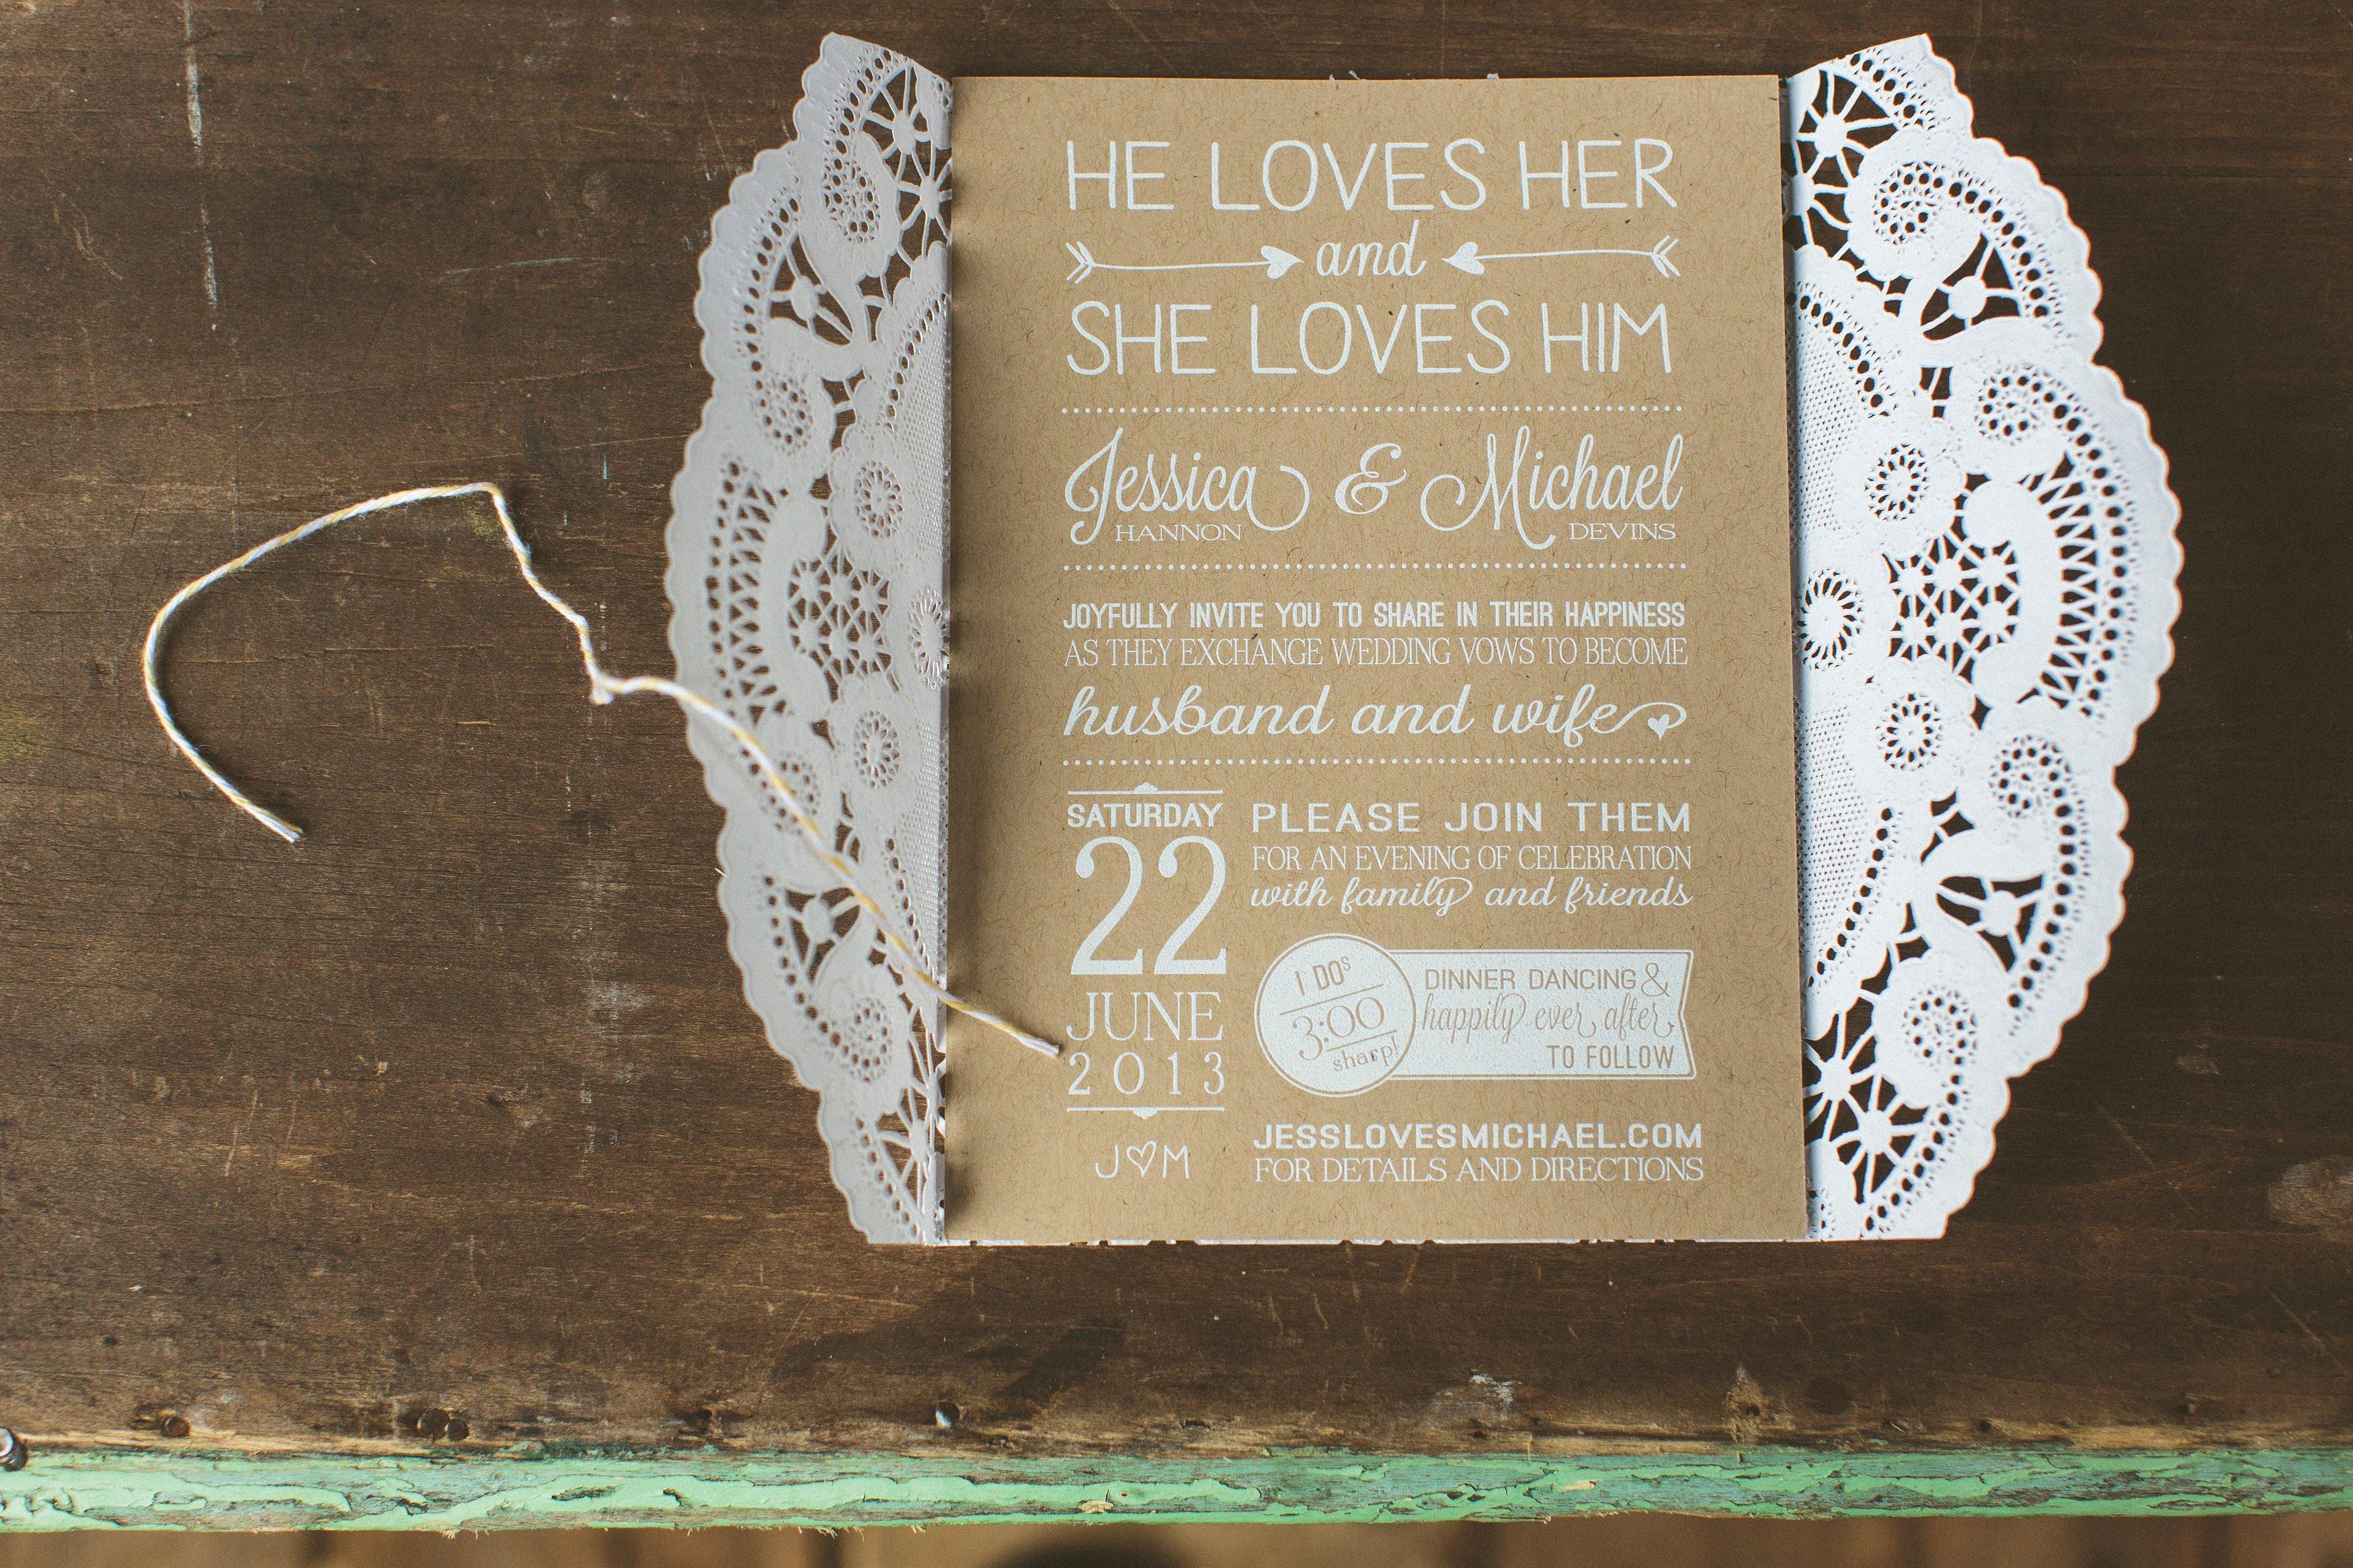 Best ideas about DIY Wedding Invites . Save or Pin Wedding Invitation Templates diy rustic wedding Now.